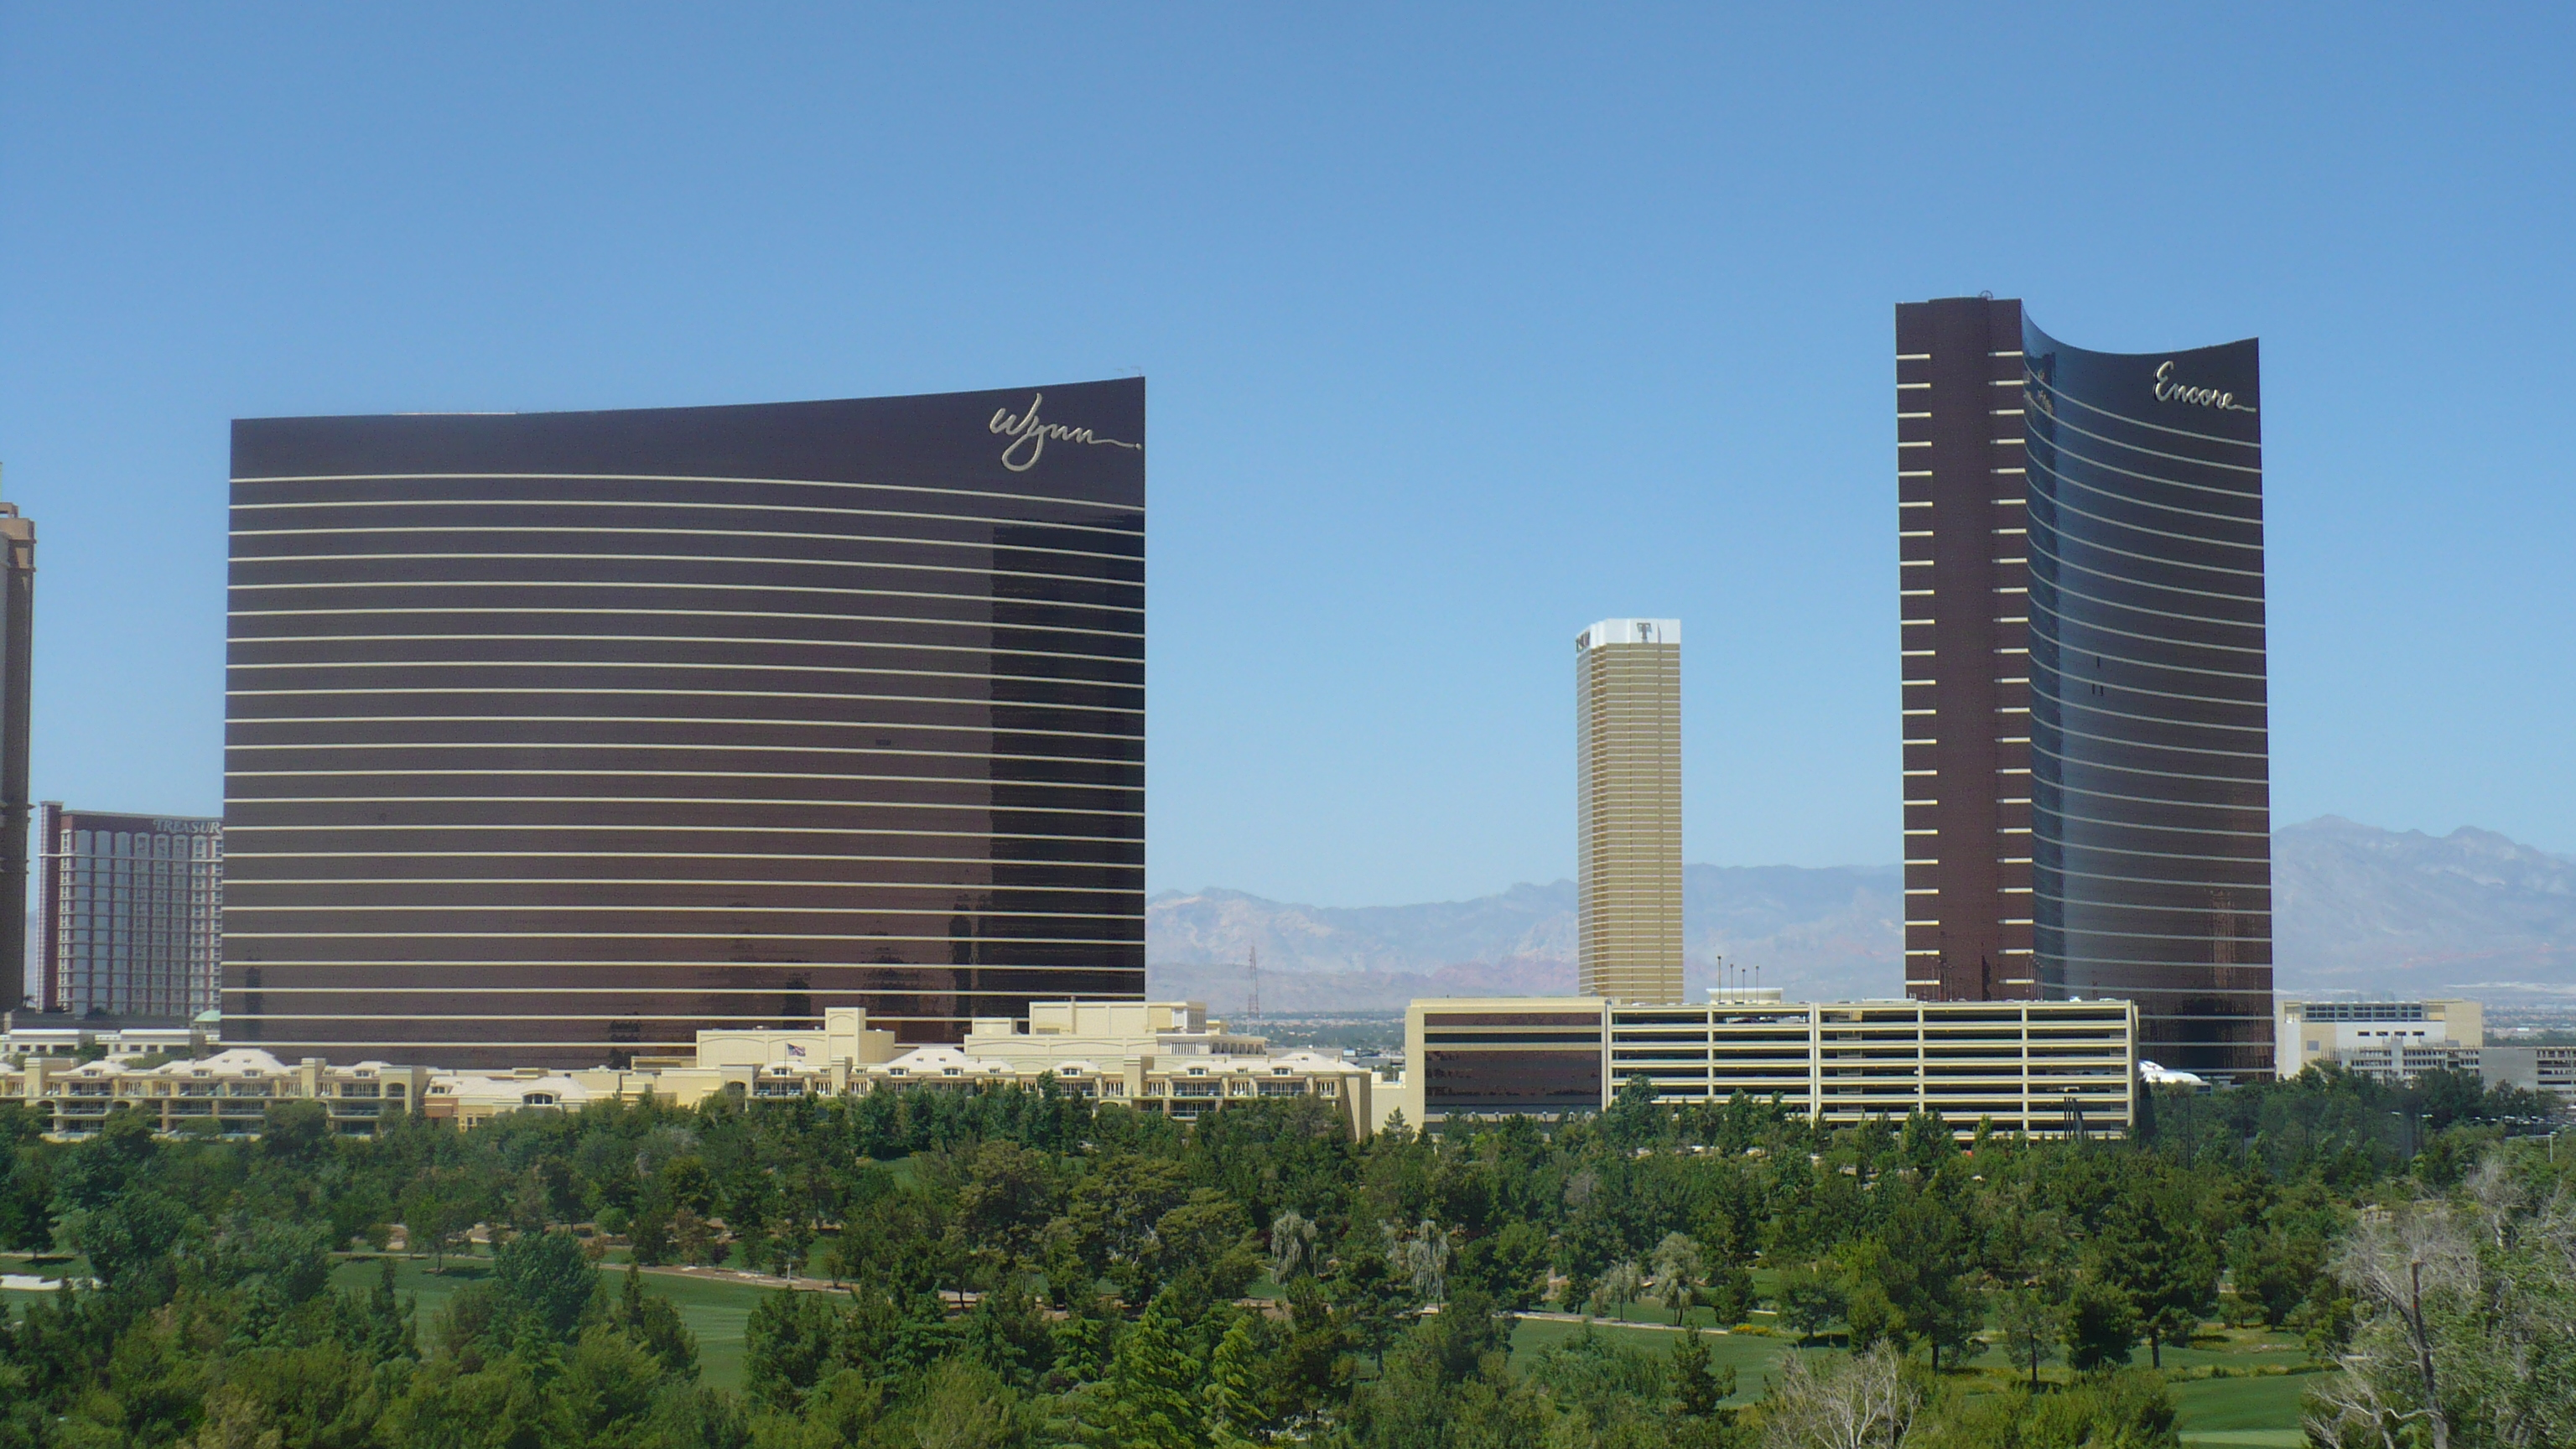 Aria resort and casino for Wynn design and development las vegas